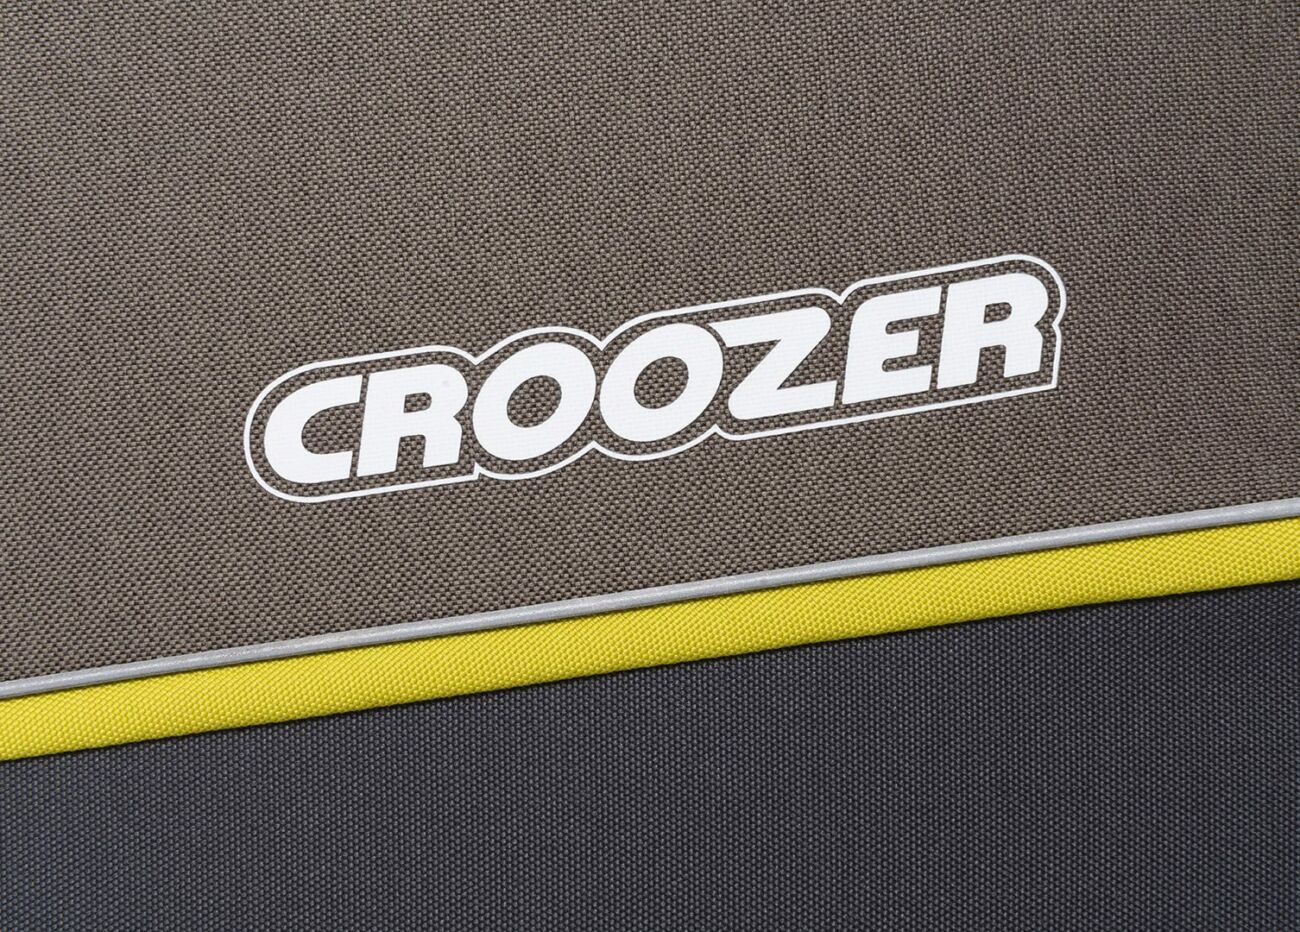 121008120 Croozer Cargo Kalle Logo Lemon Green 2020 Web